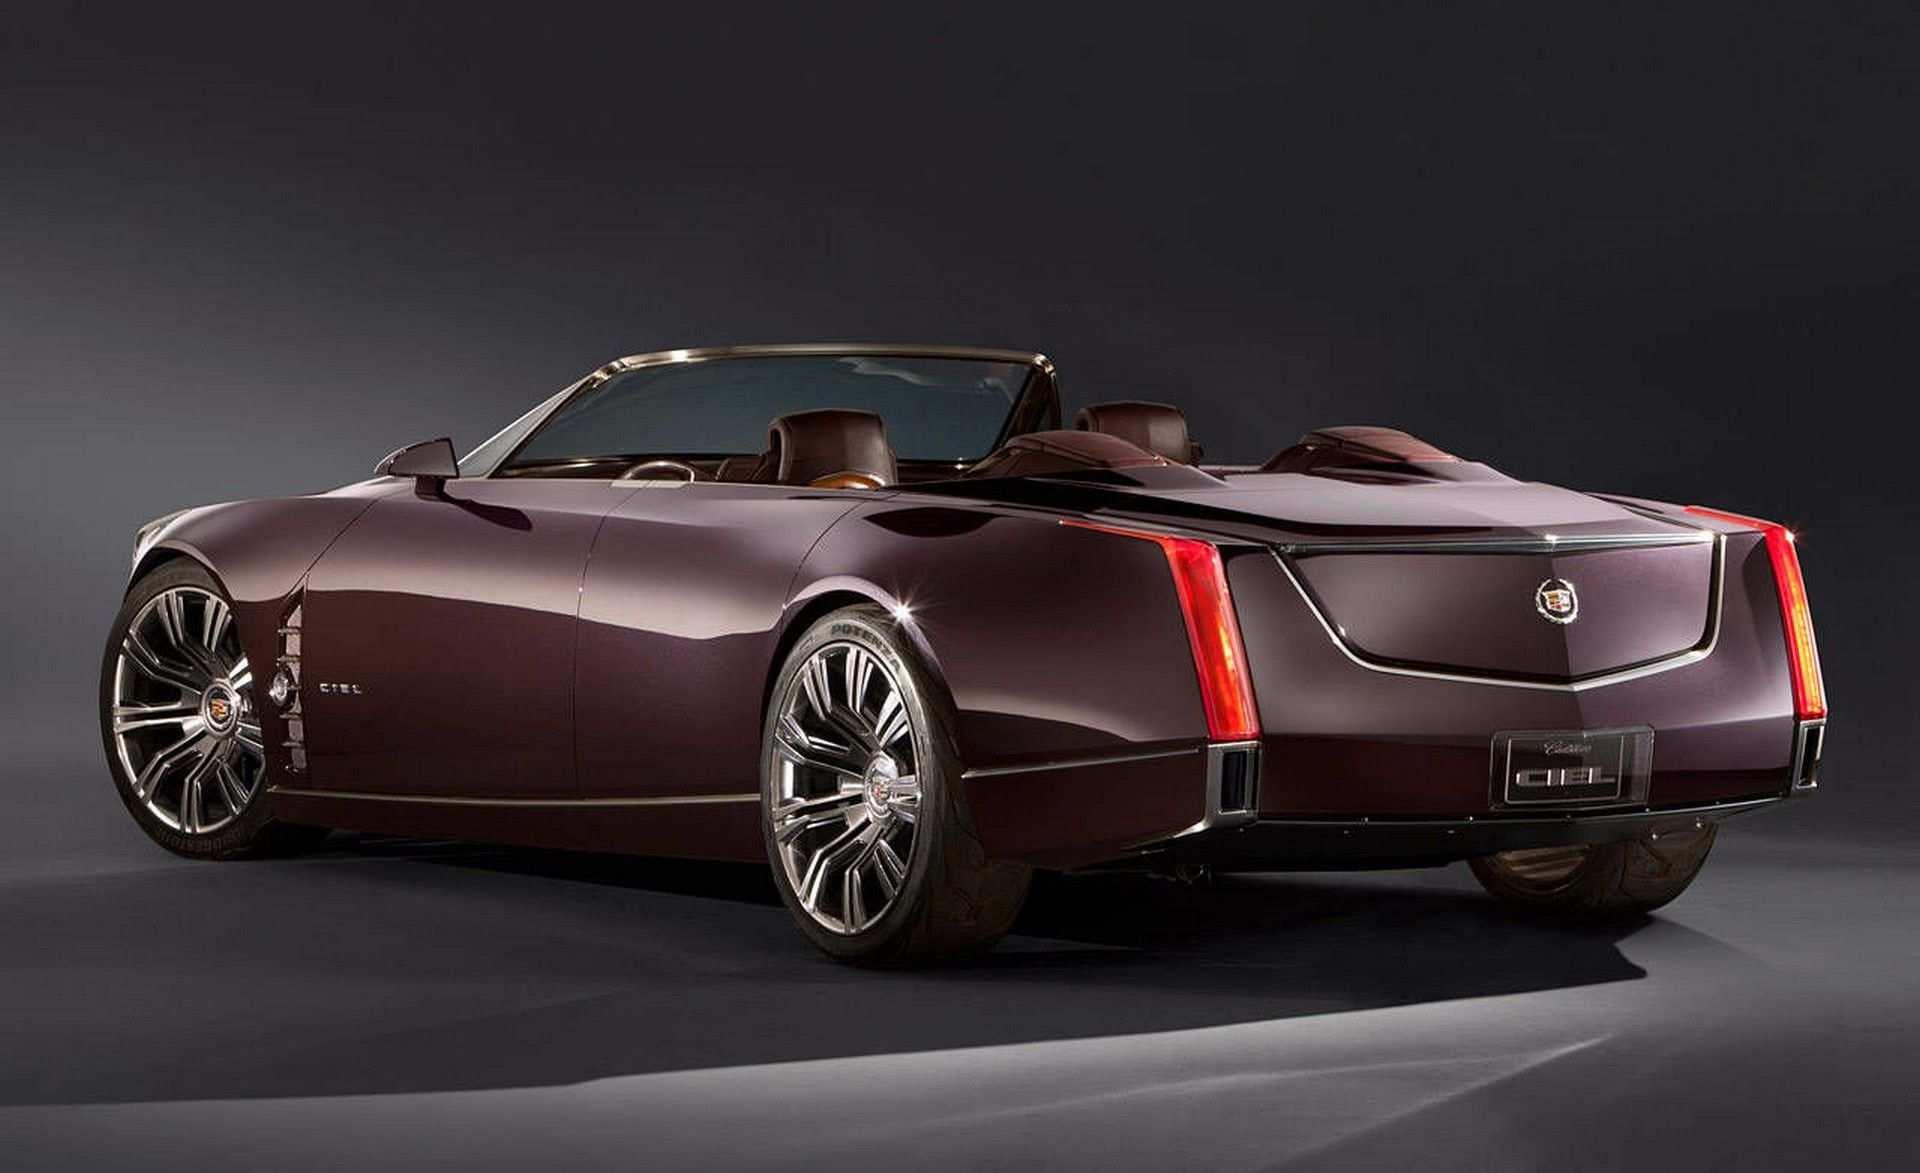 12 Gallery of 2019 Cadillac Escala Convertible New Concept for 2019 Cadillac Escala Convertible